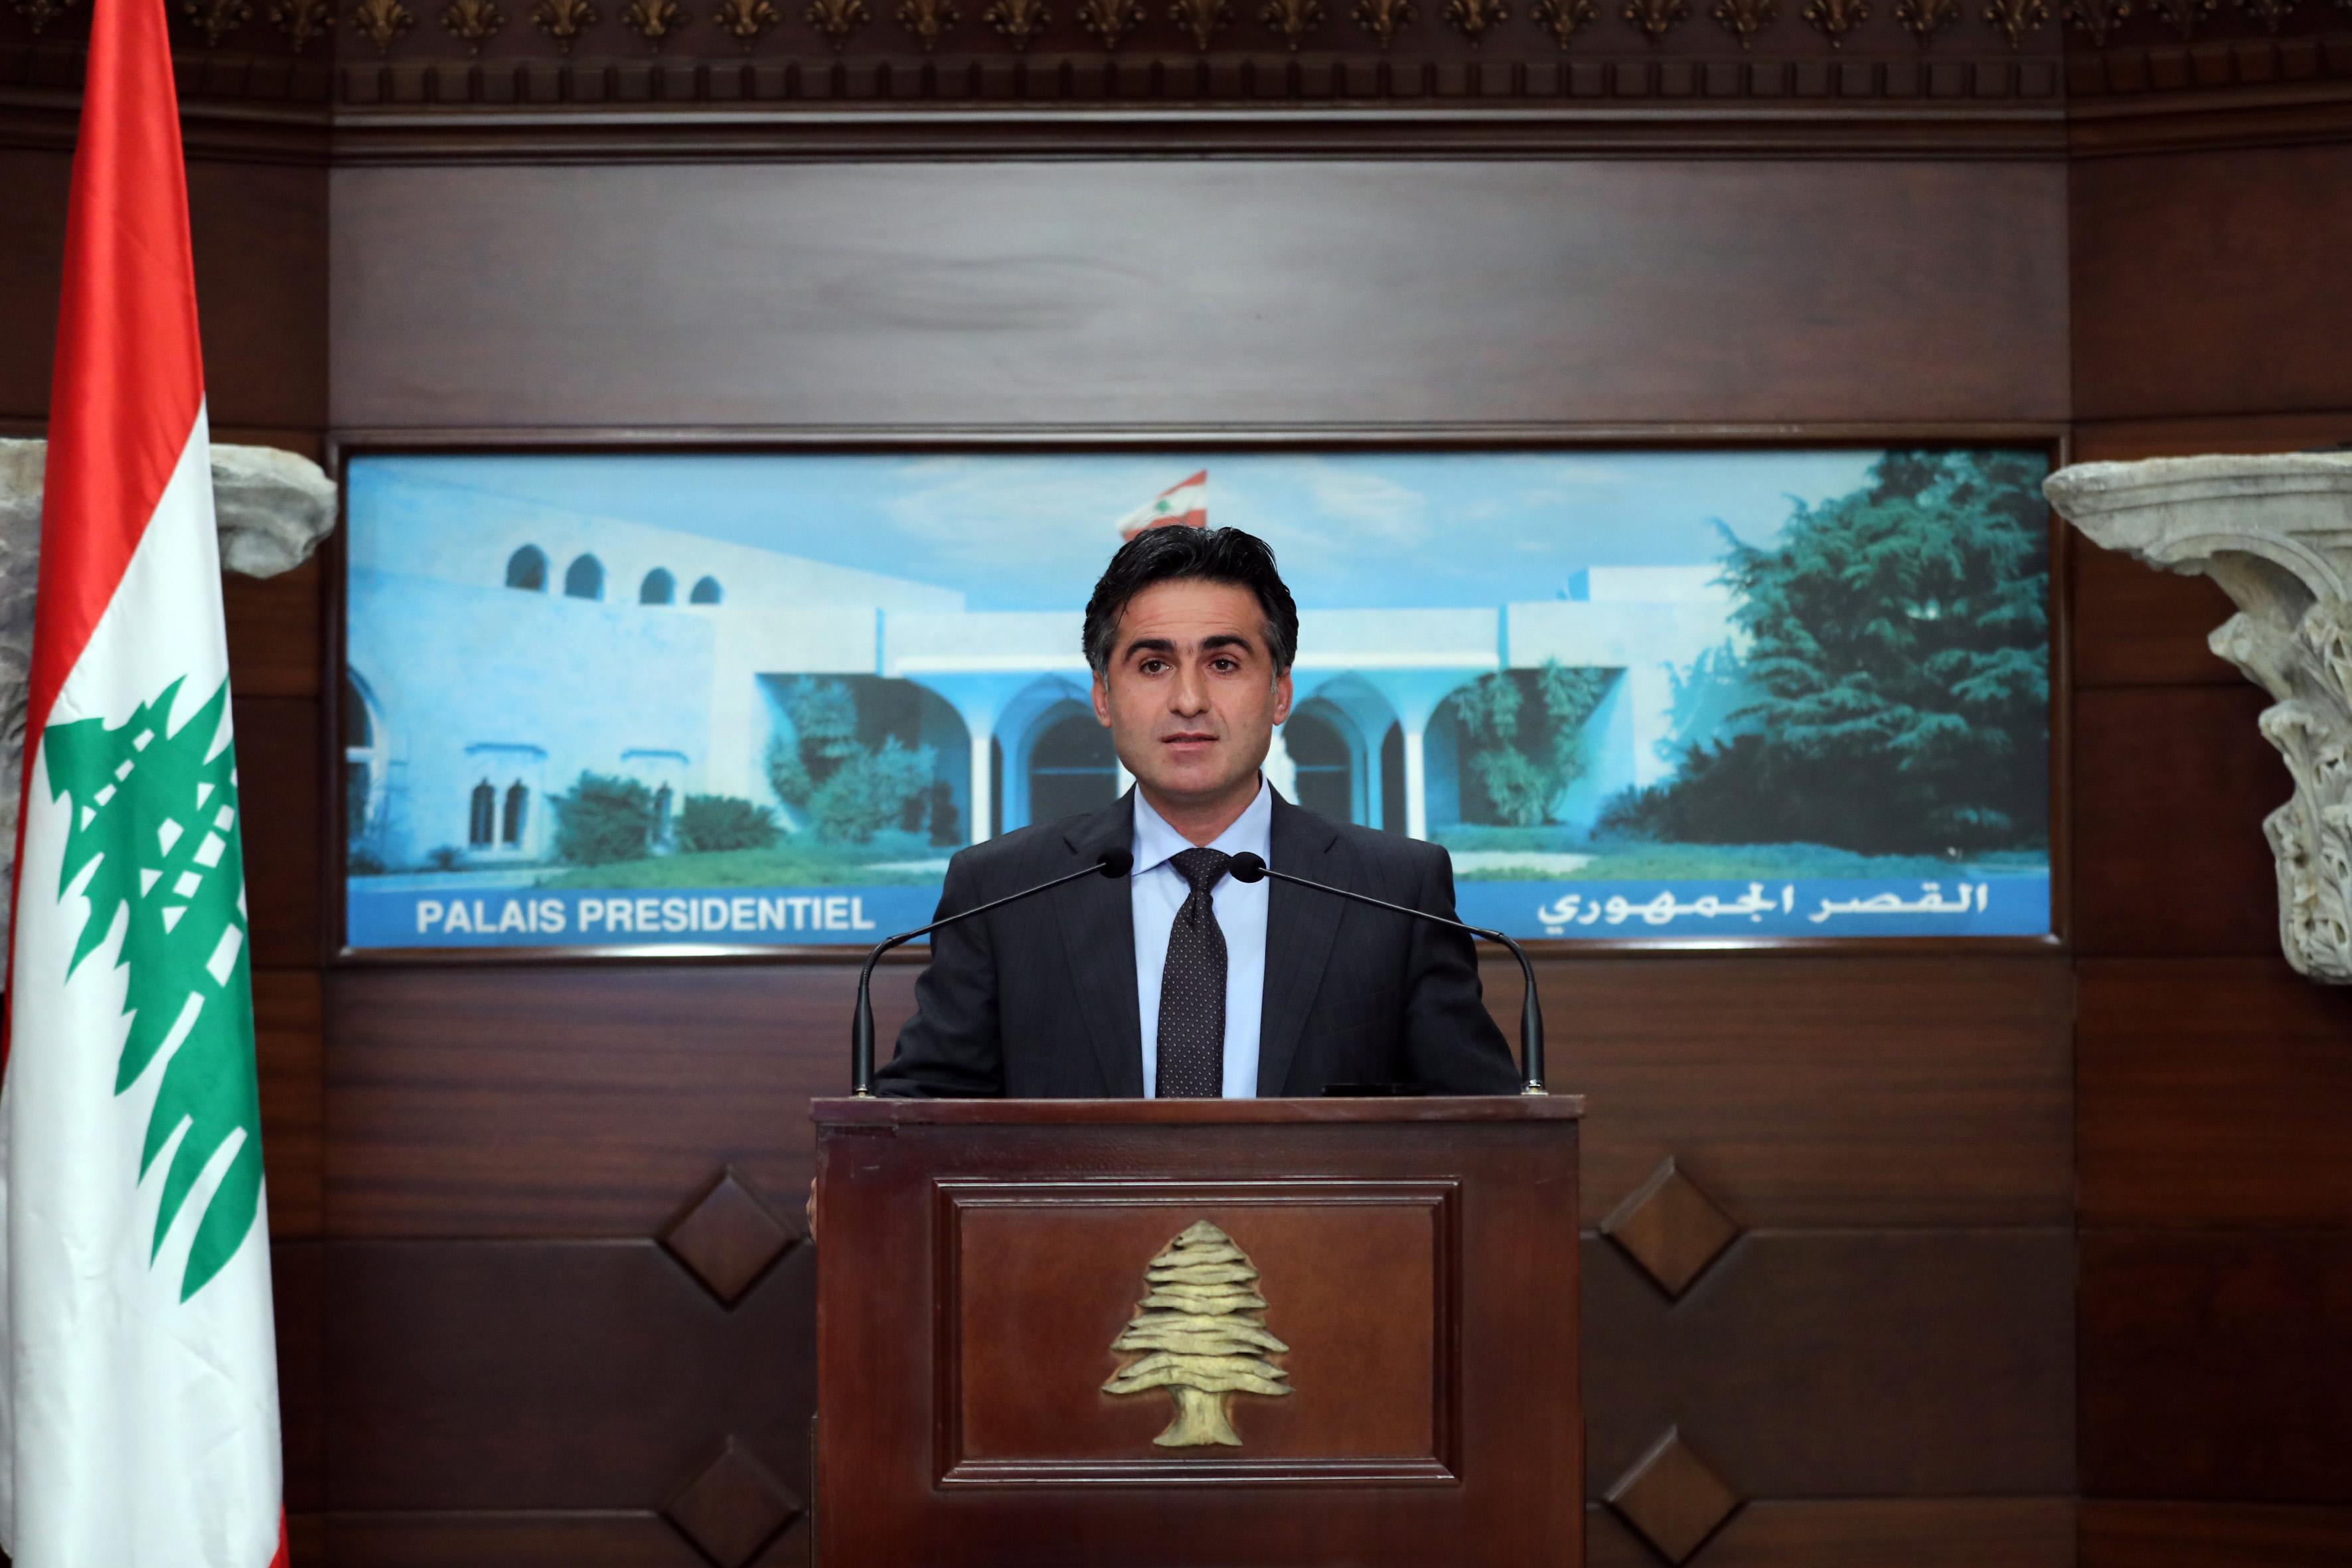 4 - Min. of Public Works & Transport Ali Hamiye